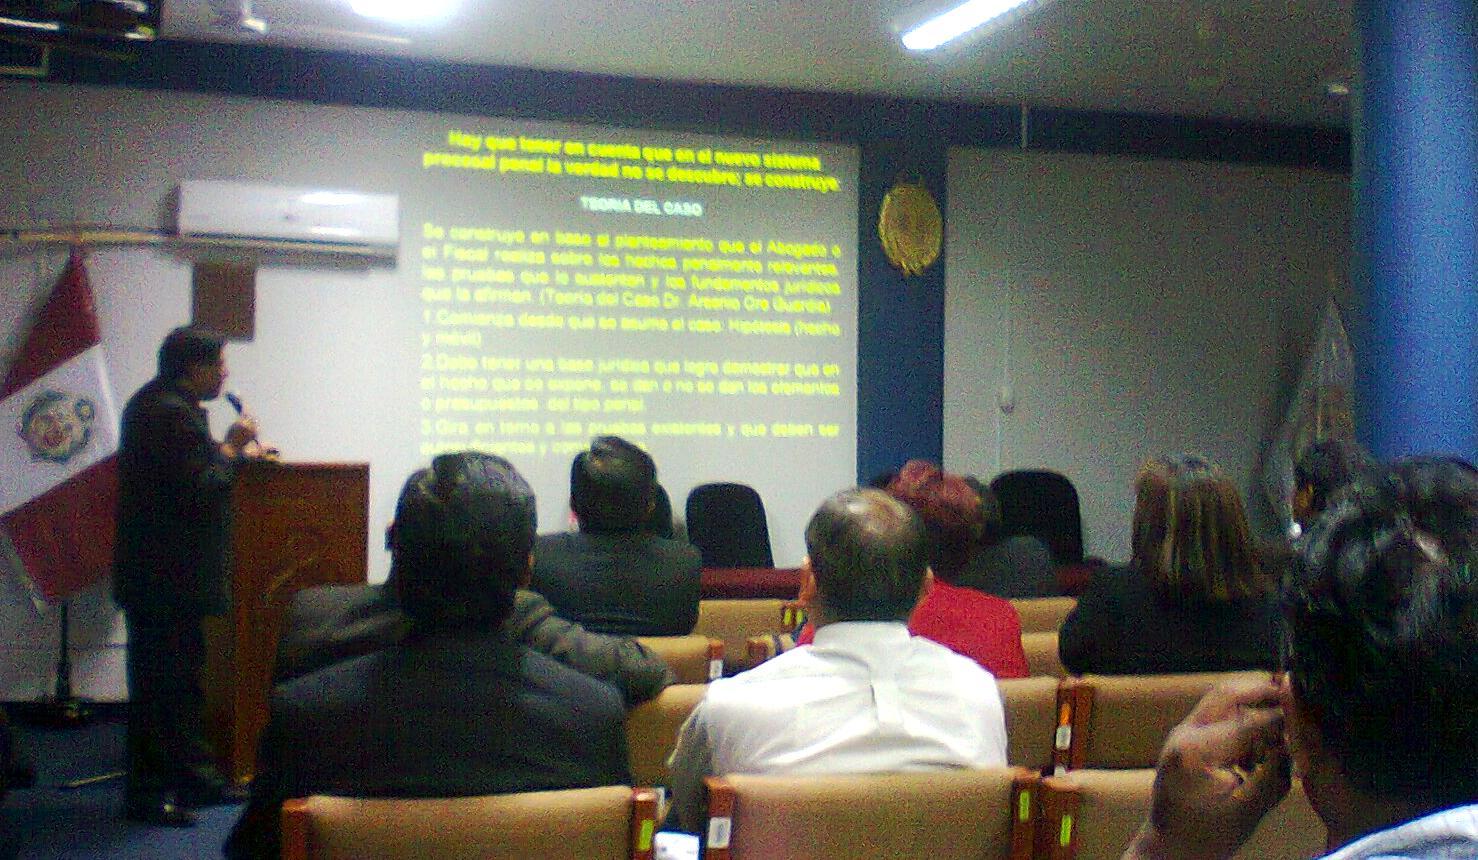 Limasurnoticias ministerio p blico y polic a nacional realizan taller sobre investigaci n del for Ministerio policia nacional